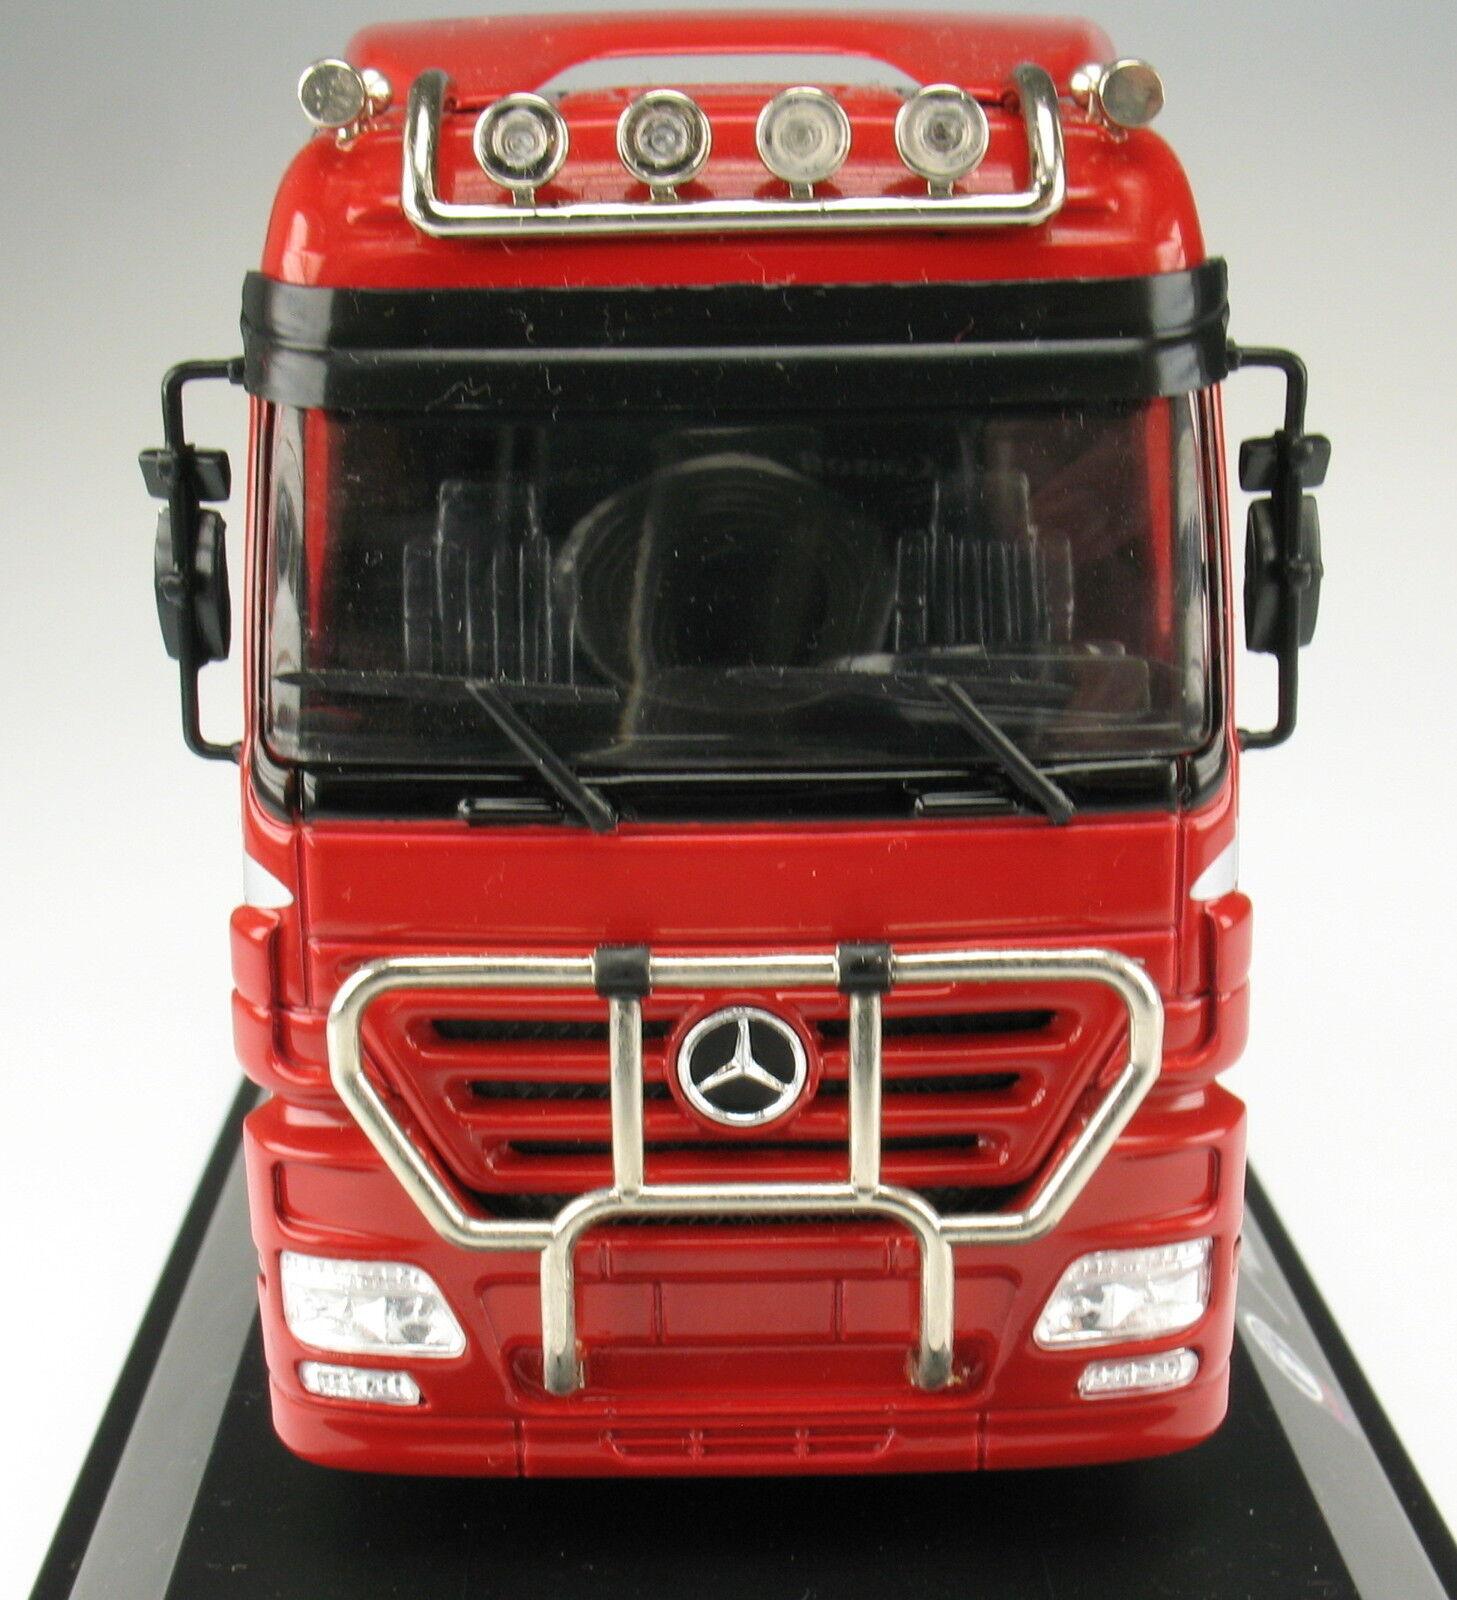 NZG - Mercedes-Benz ACTROS 1841 MP2 mit Bullenfänger - LIMITIERT 136 999 - 1 50